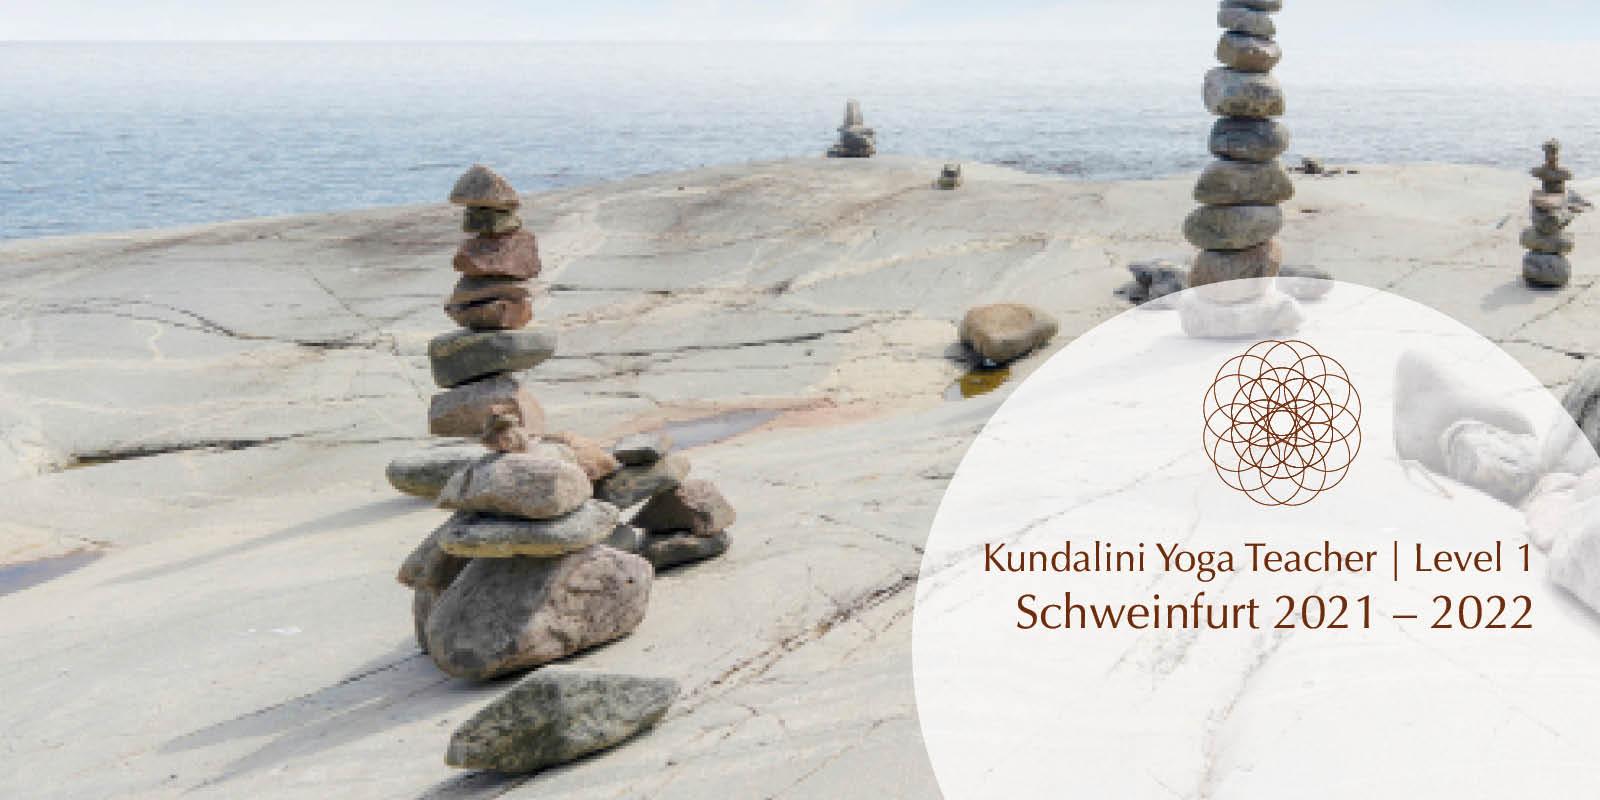 Stufe 1 Schweinfurt 2021-2022